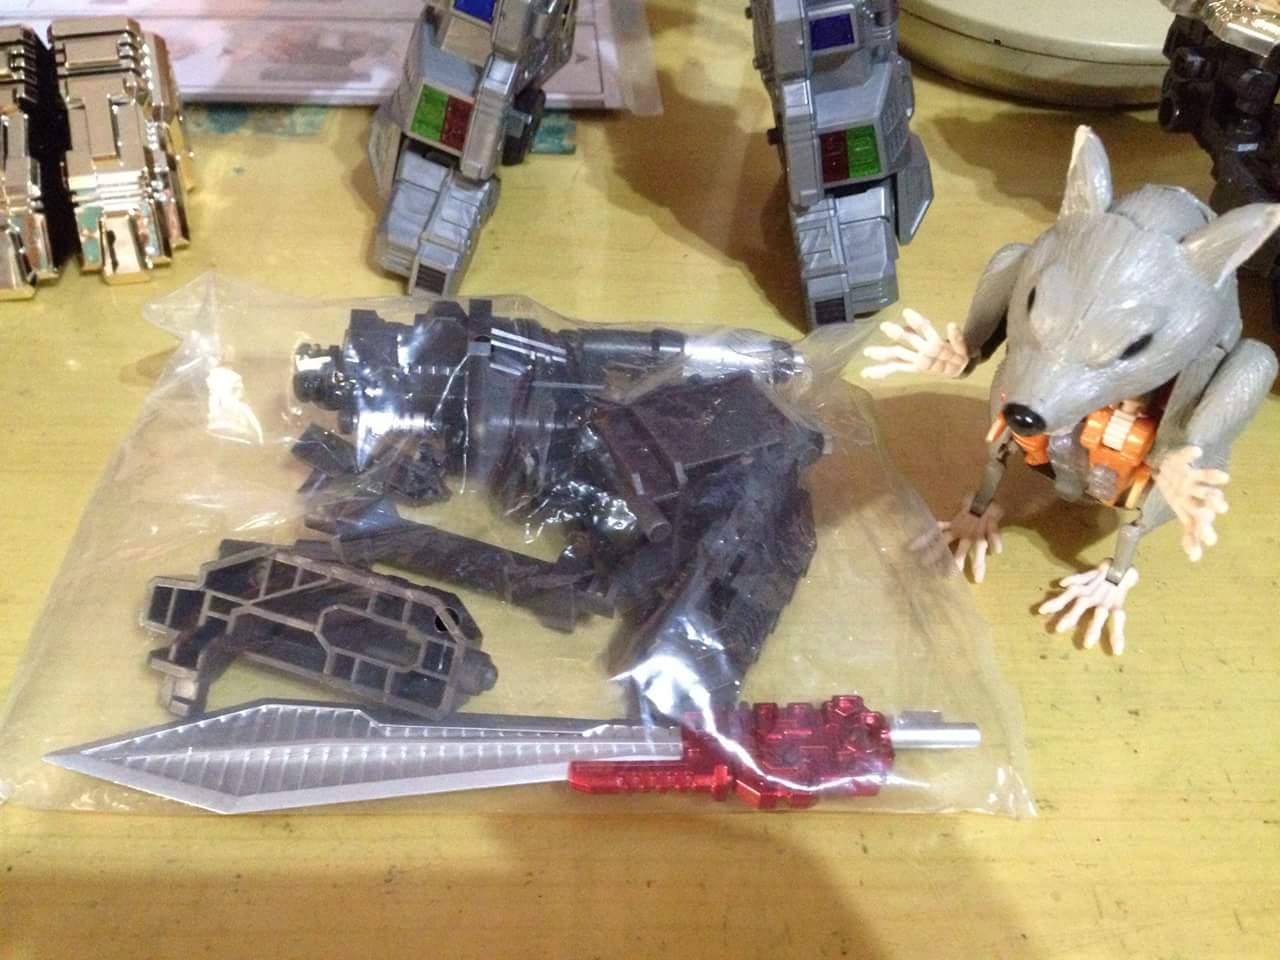 [GCreation] Produit Tiers - Jouet ShuraKing - aka Combiner Dinobots - Page 3 LQlG8wFY